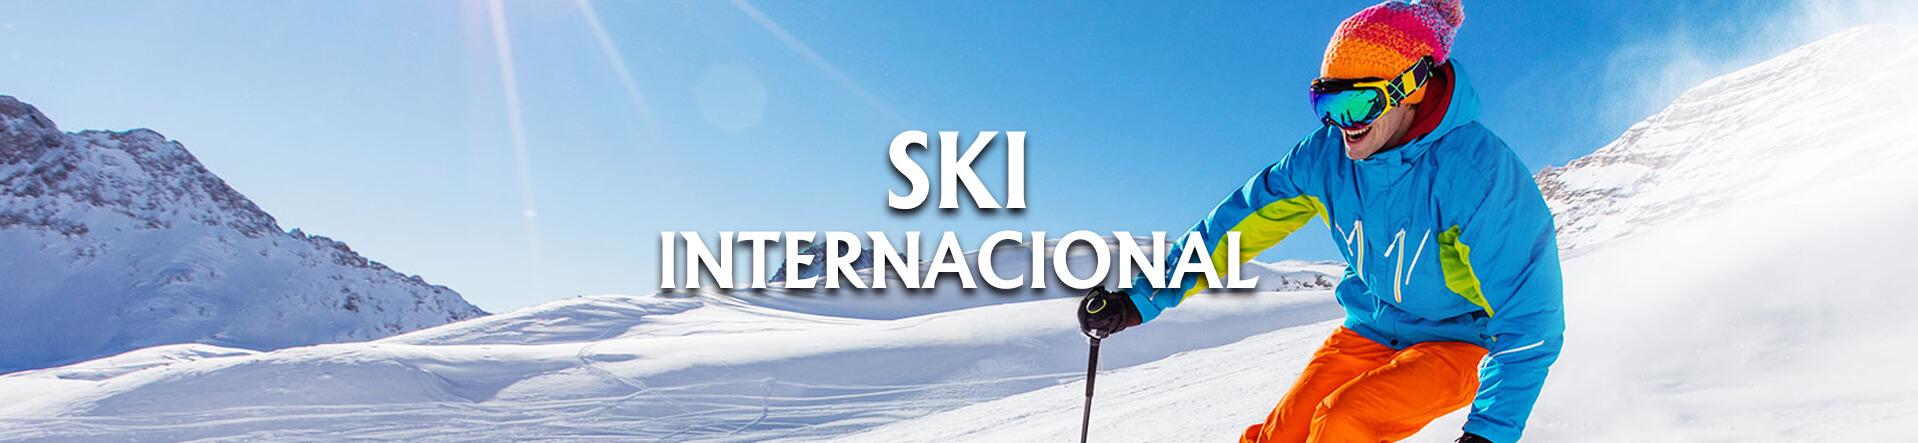 Ski Internacional desde Argentina